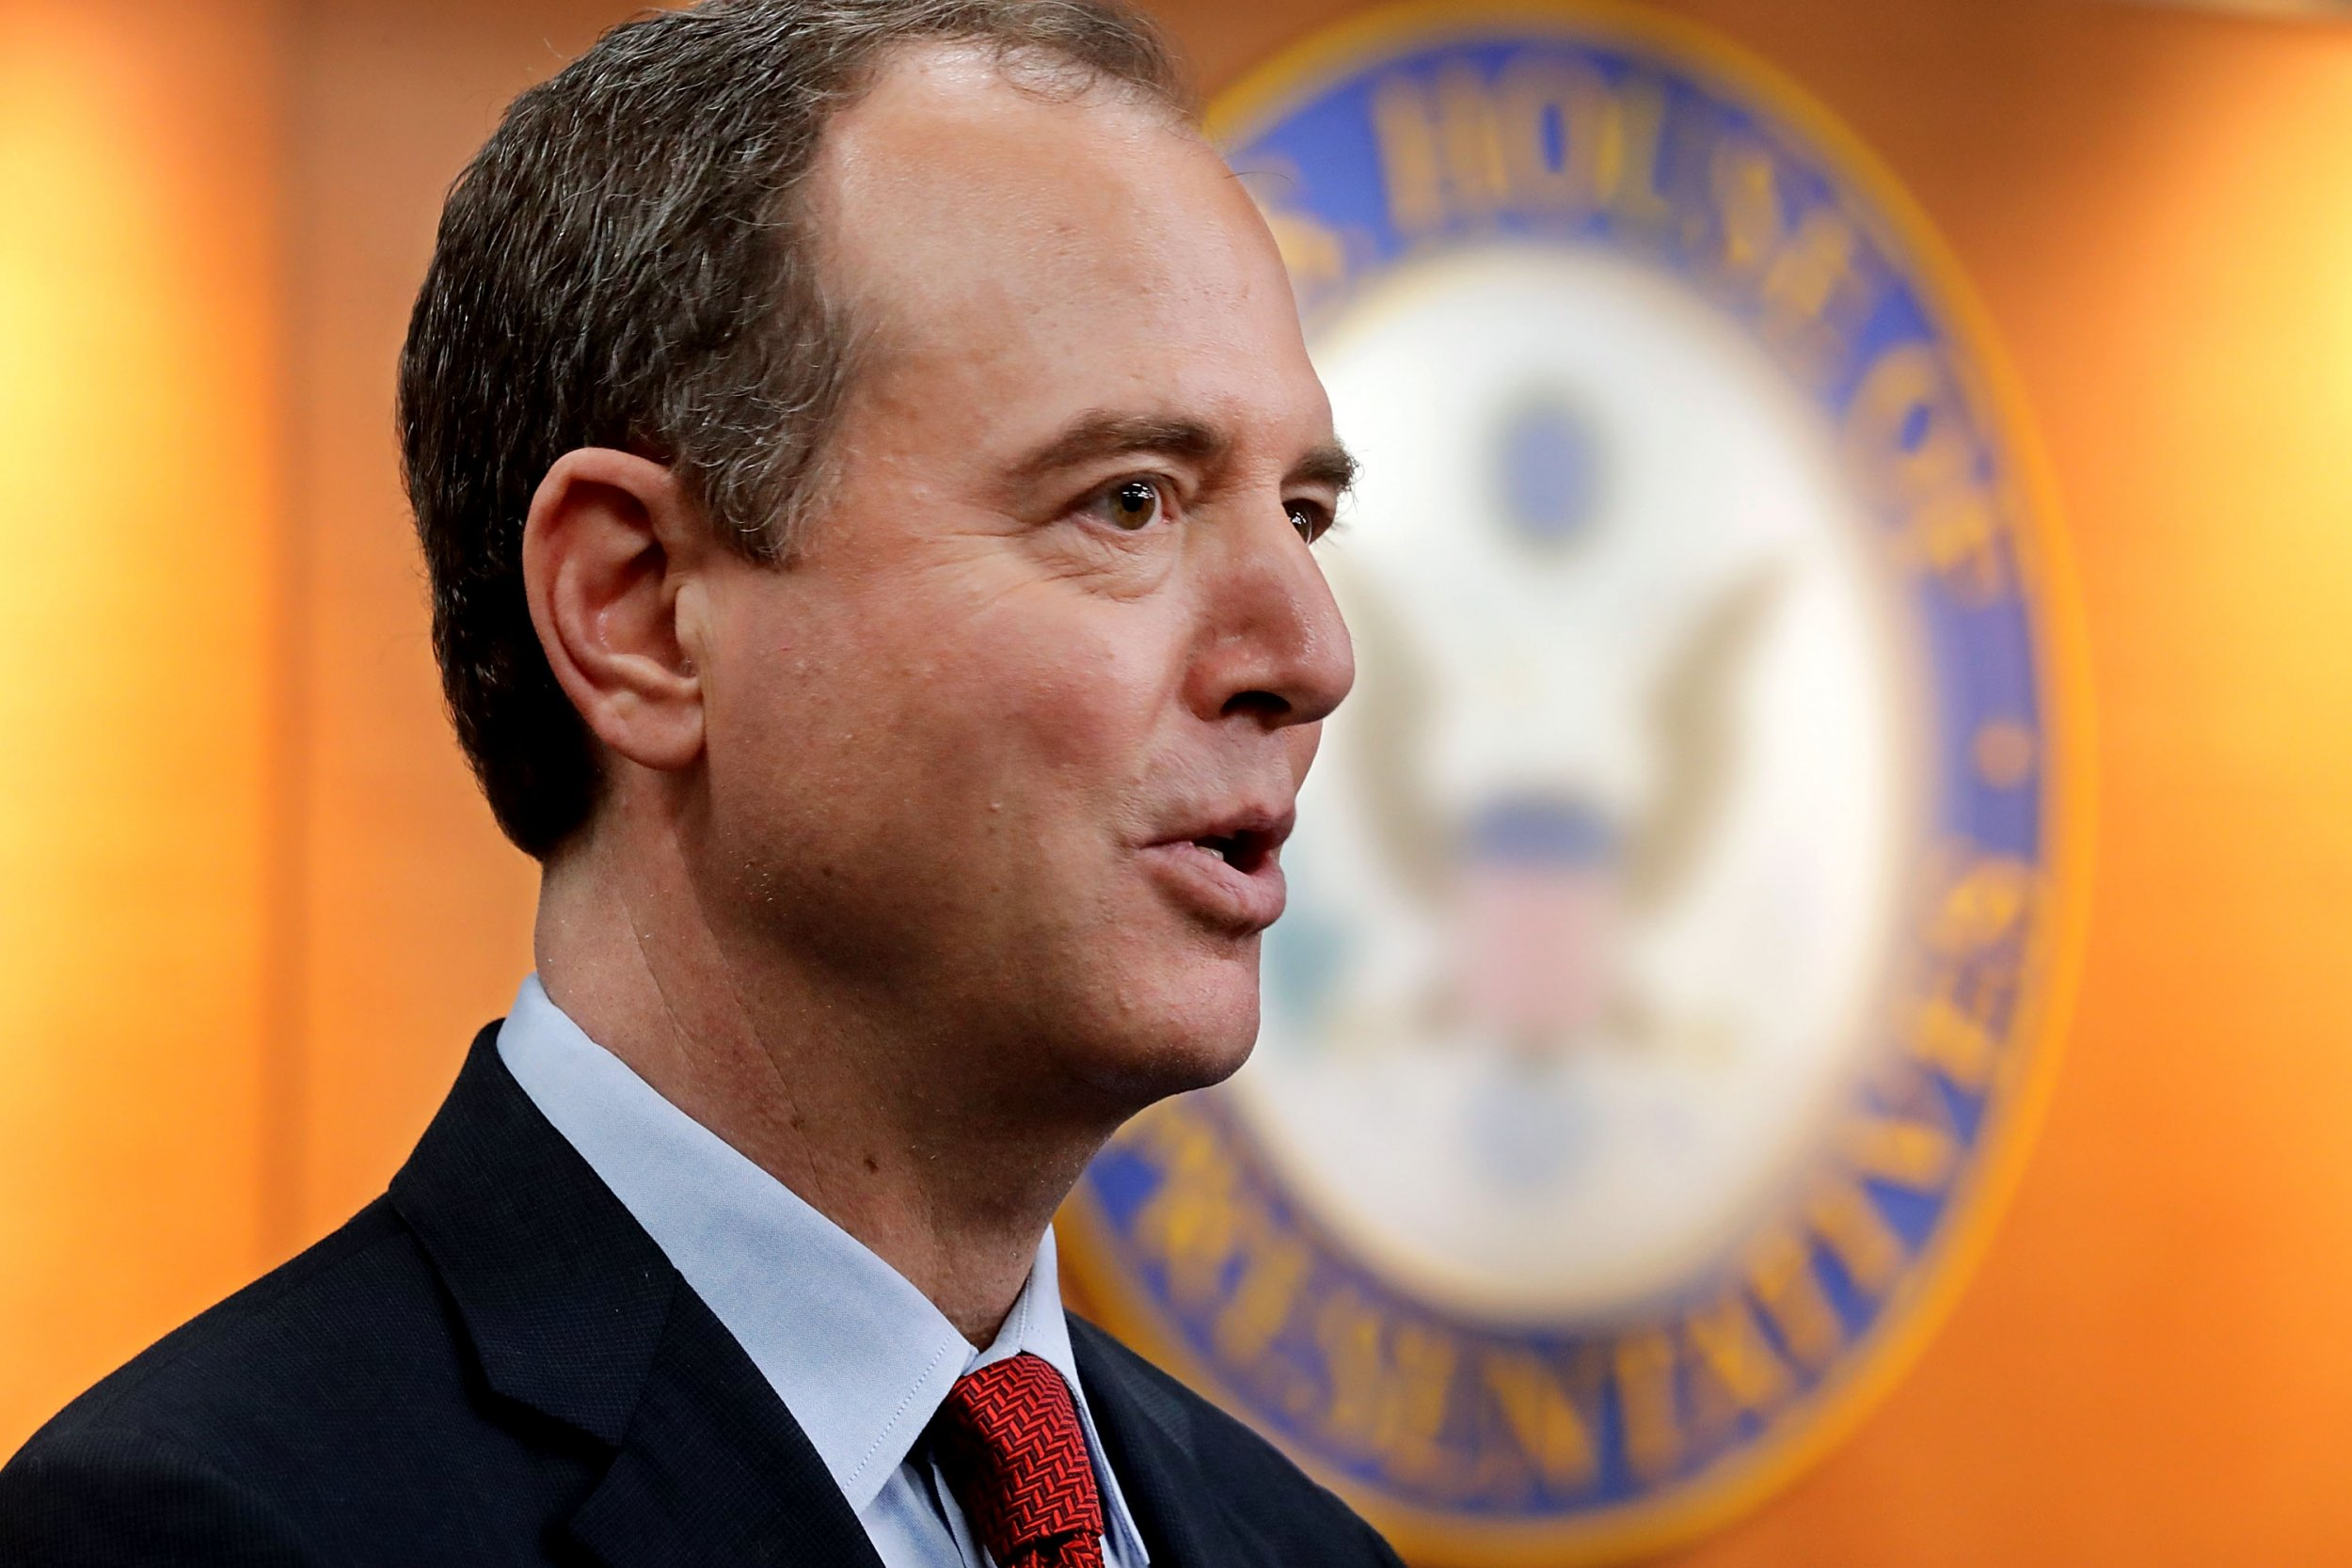 Adam Schiff, Democrats, Hire, Daniel Goldman, prosecutor, Trump